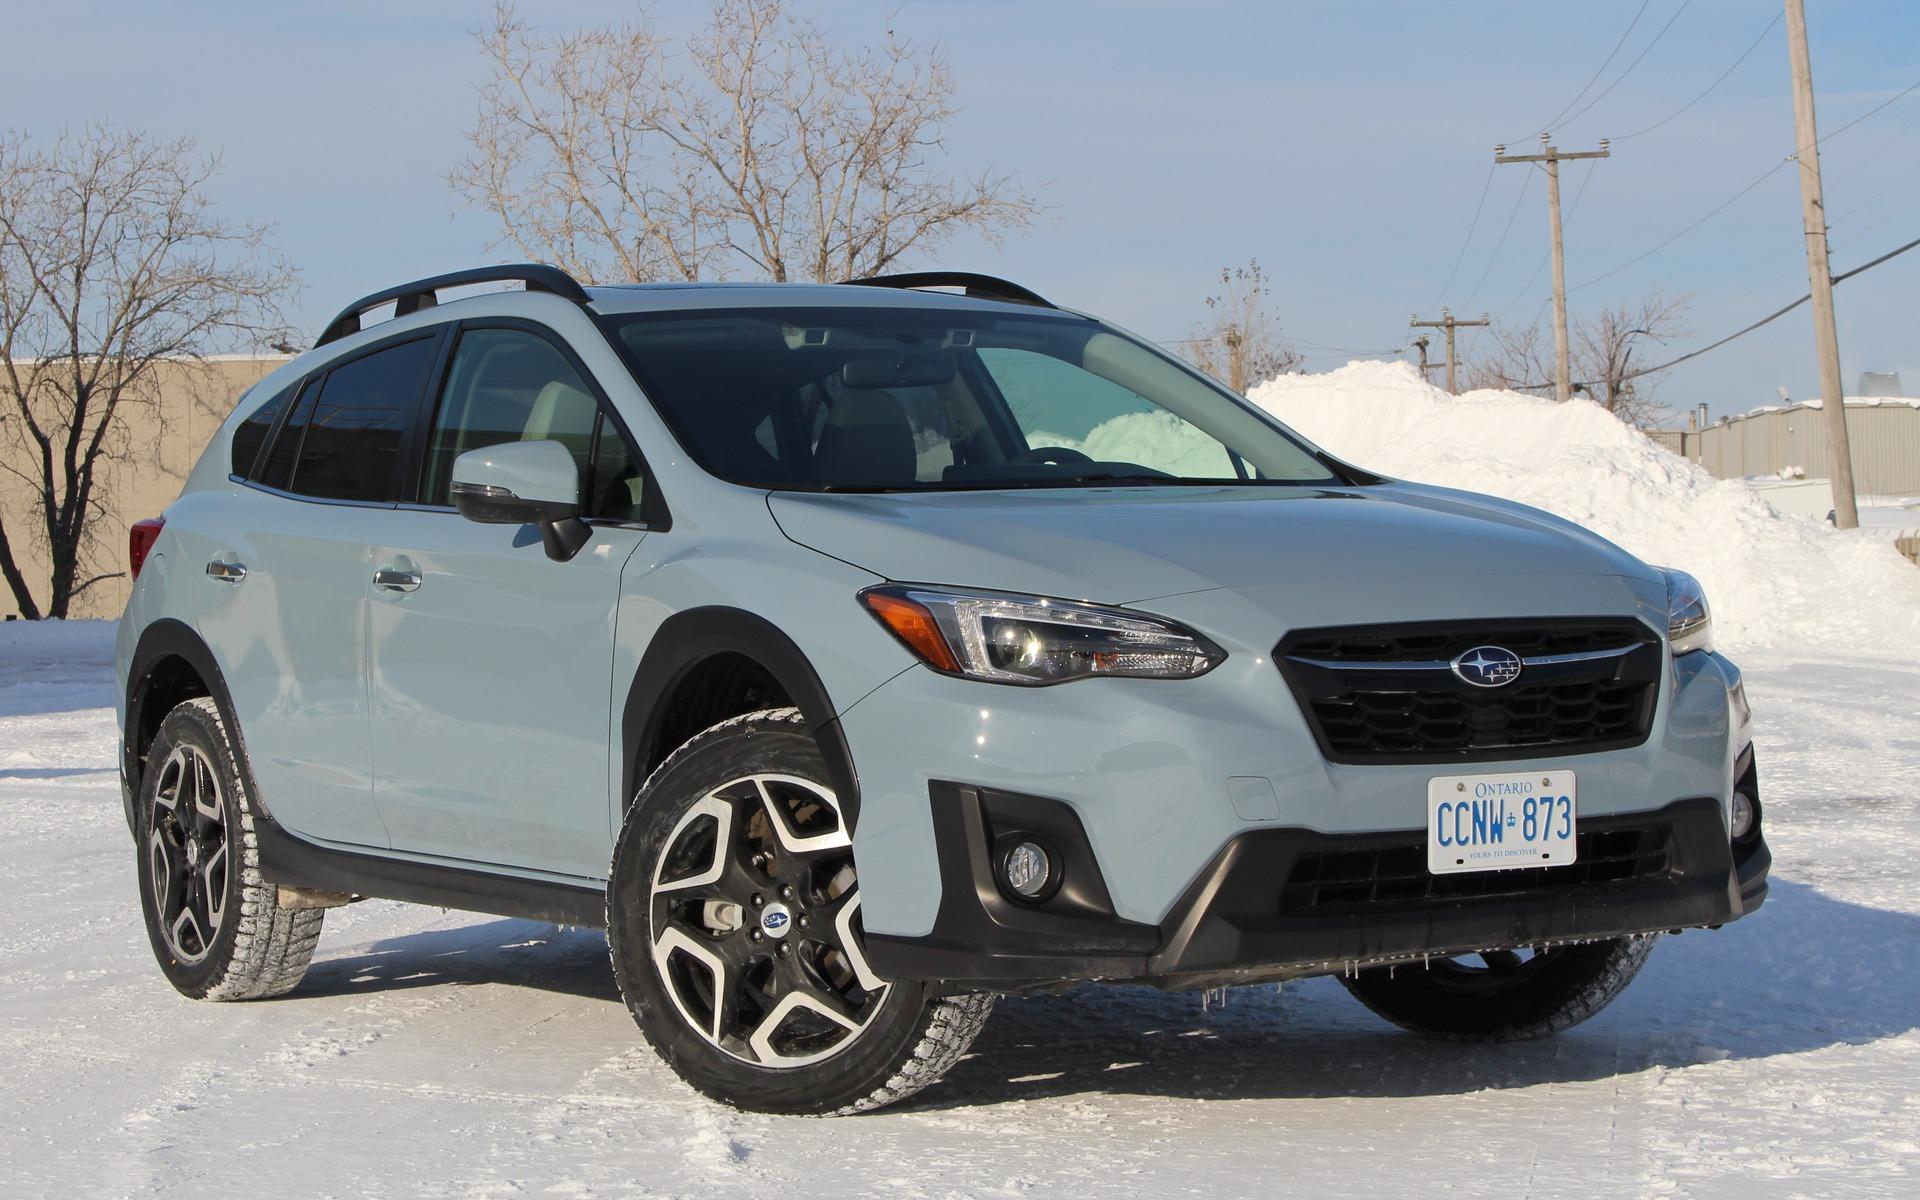 Subaru Crosstrek 2019 : à la mode 343897_2018_Subaru_Crosstrek